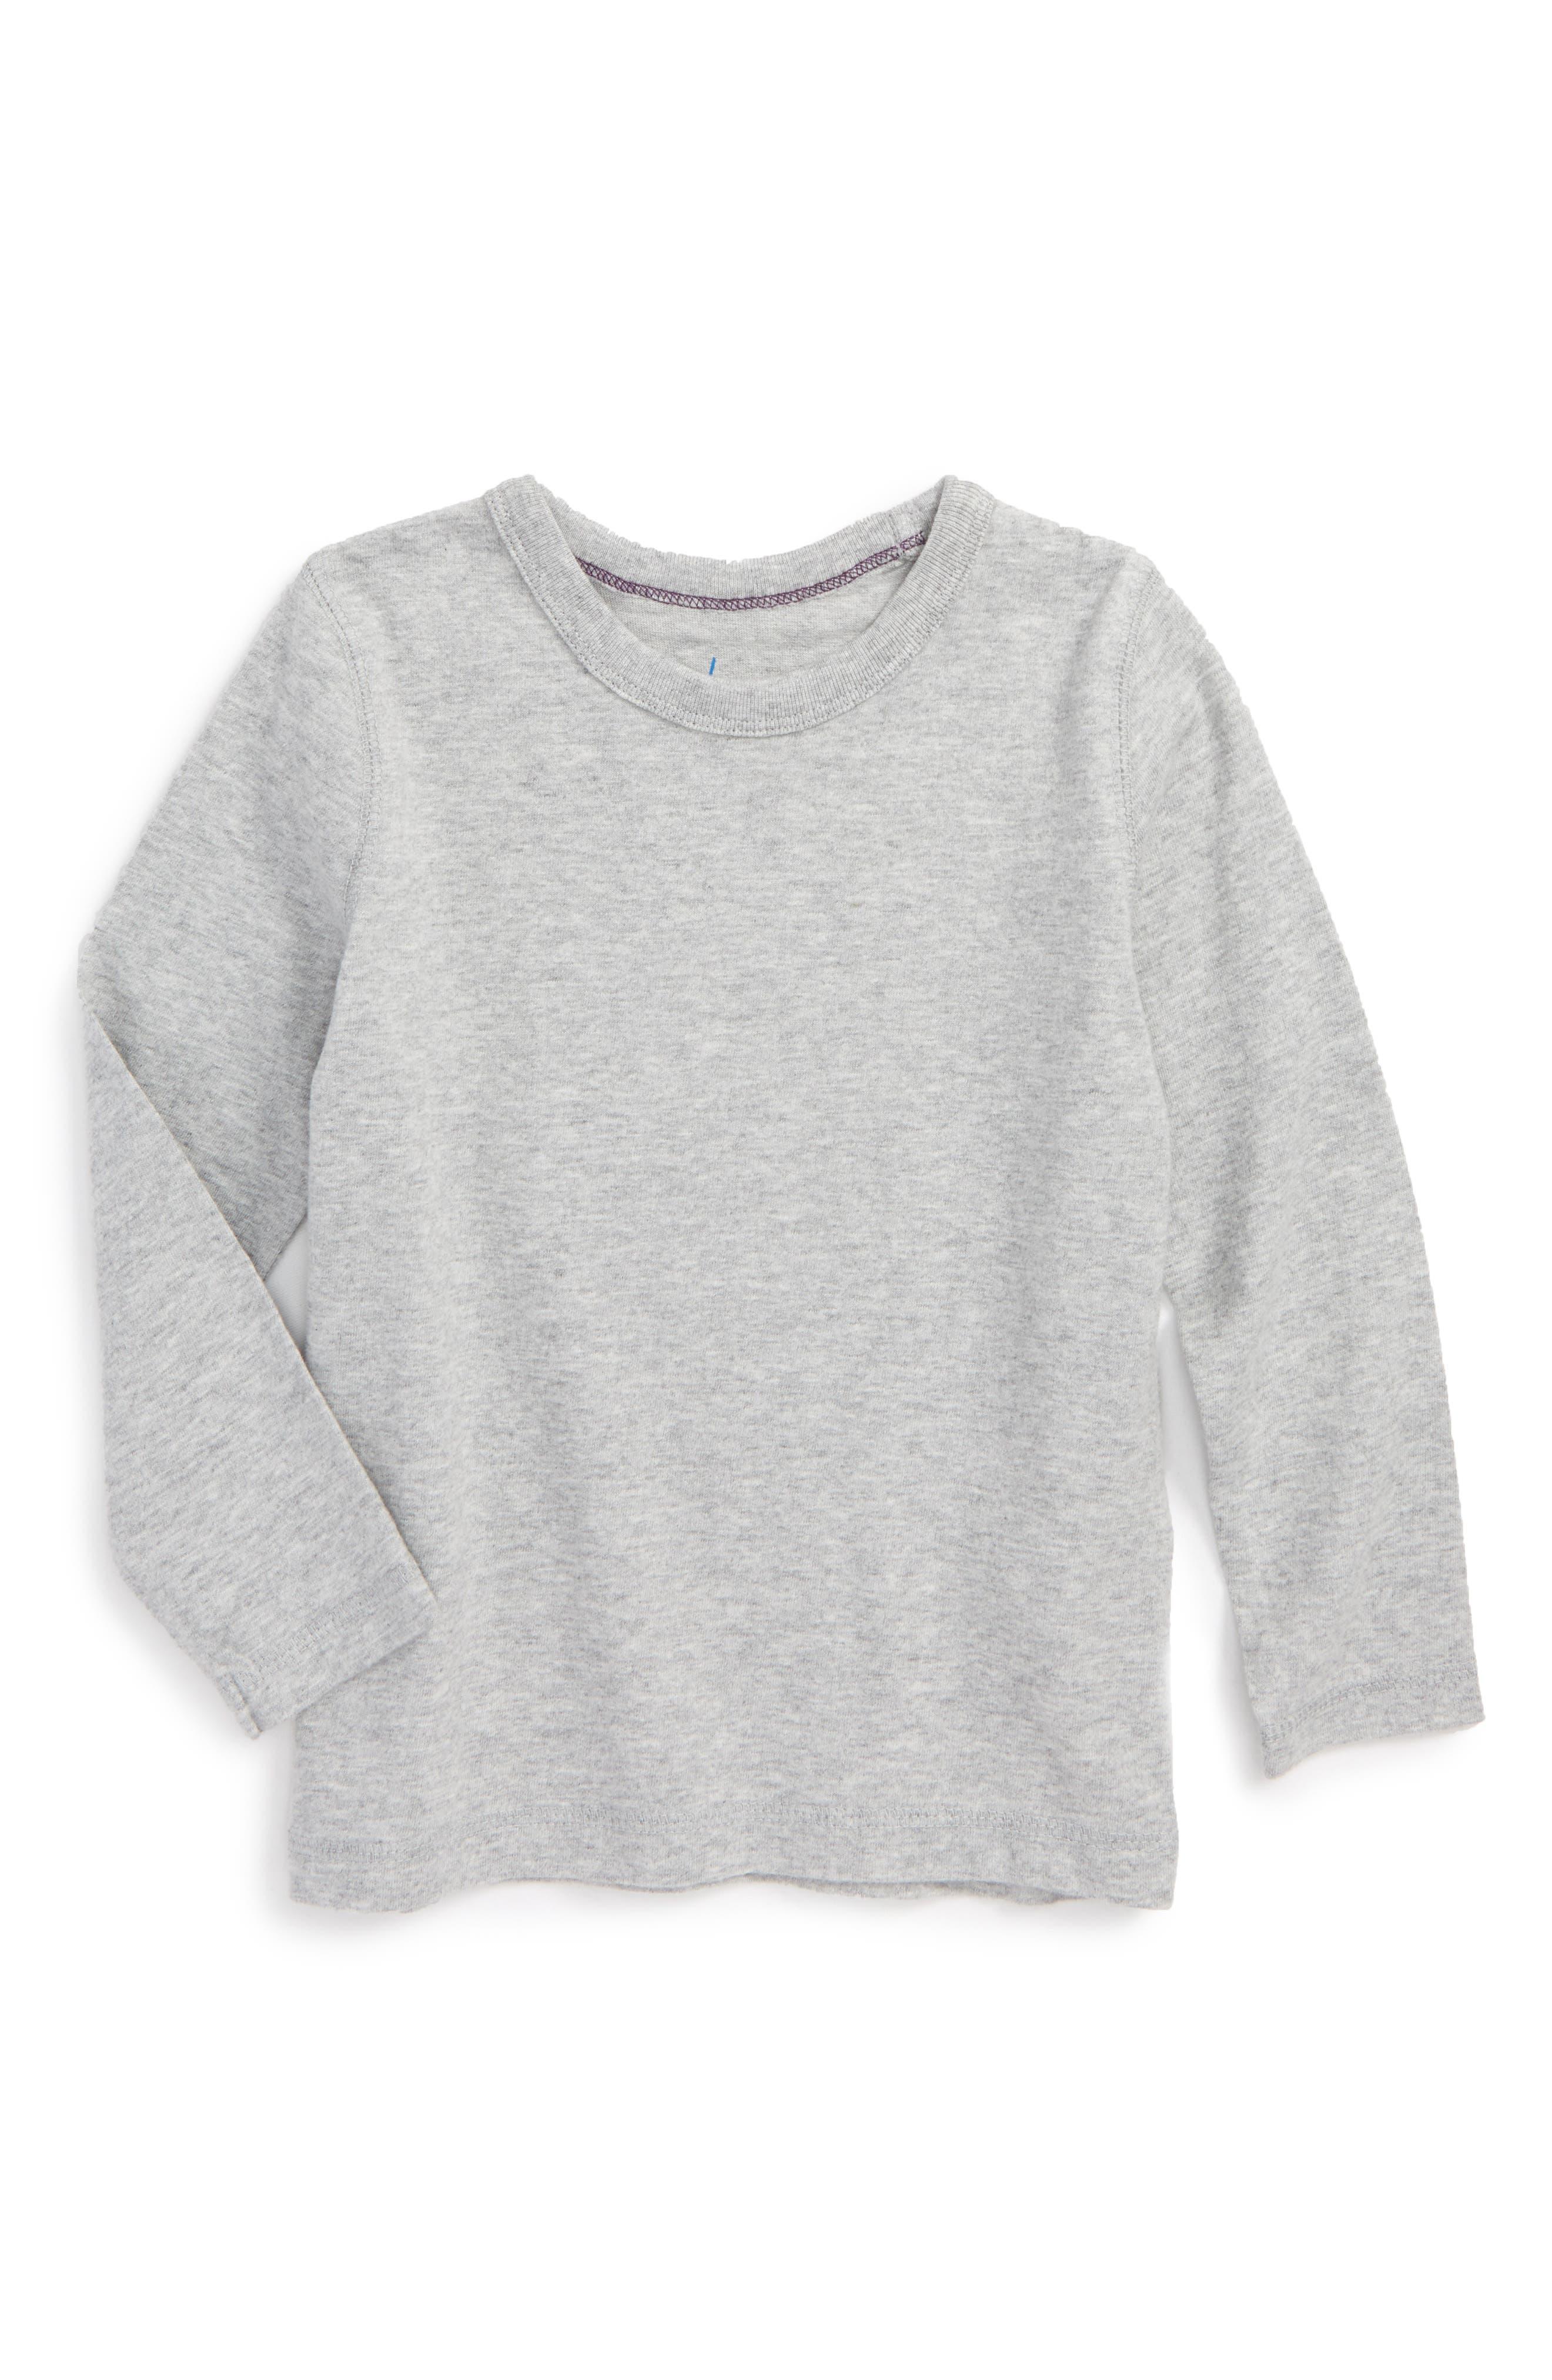 Mini Boden Supersoft Solid T-Shirt (Toddler Boys, Little Boys & Big Boys)